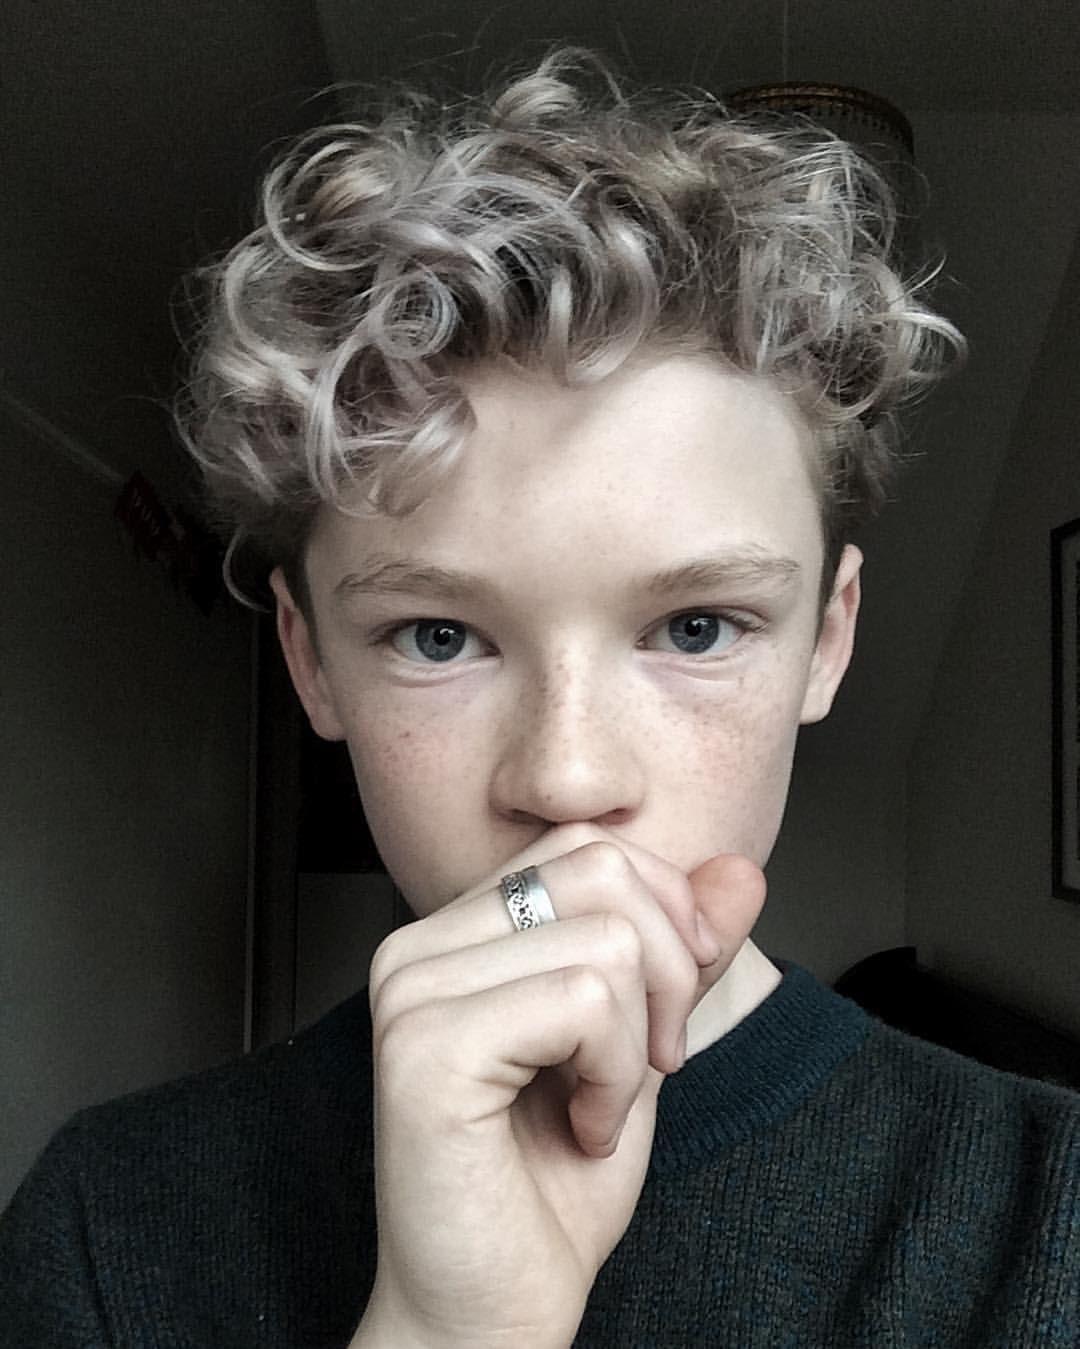 Long Curly Hair Men Highlights Long Curly Hair Men Curly Hair Men Hair Highlights